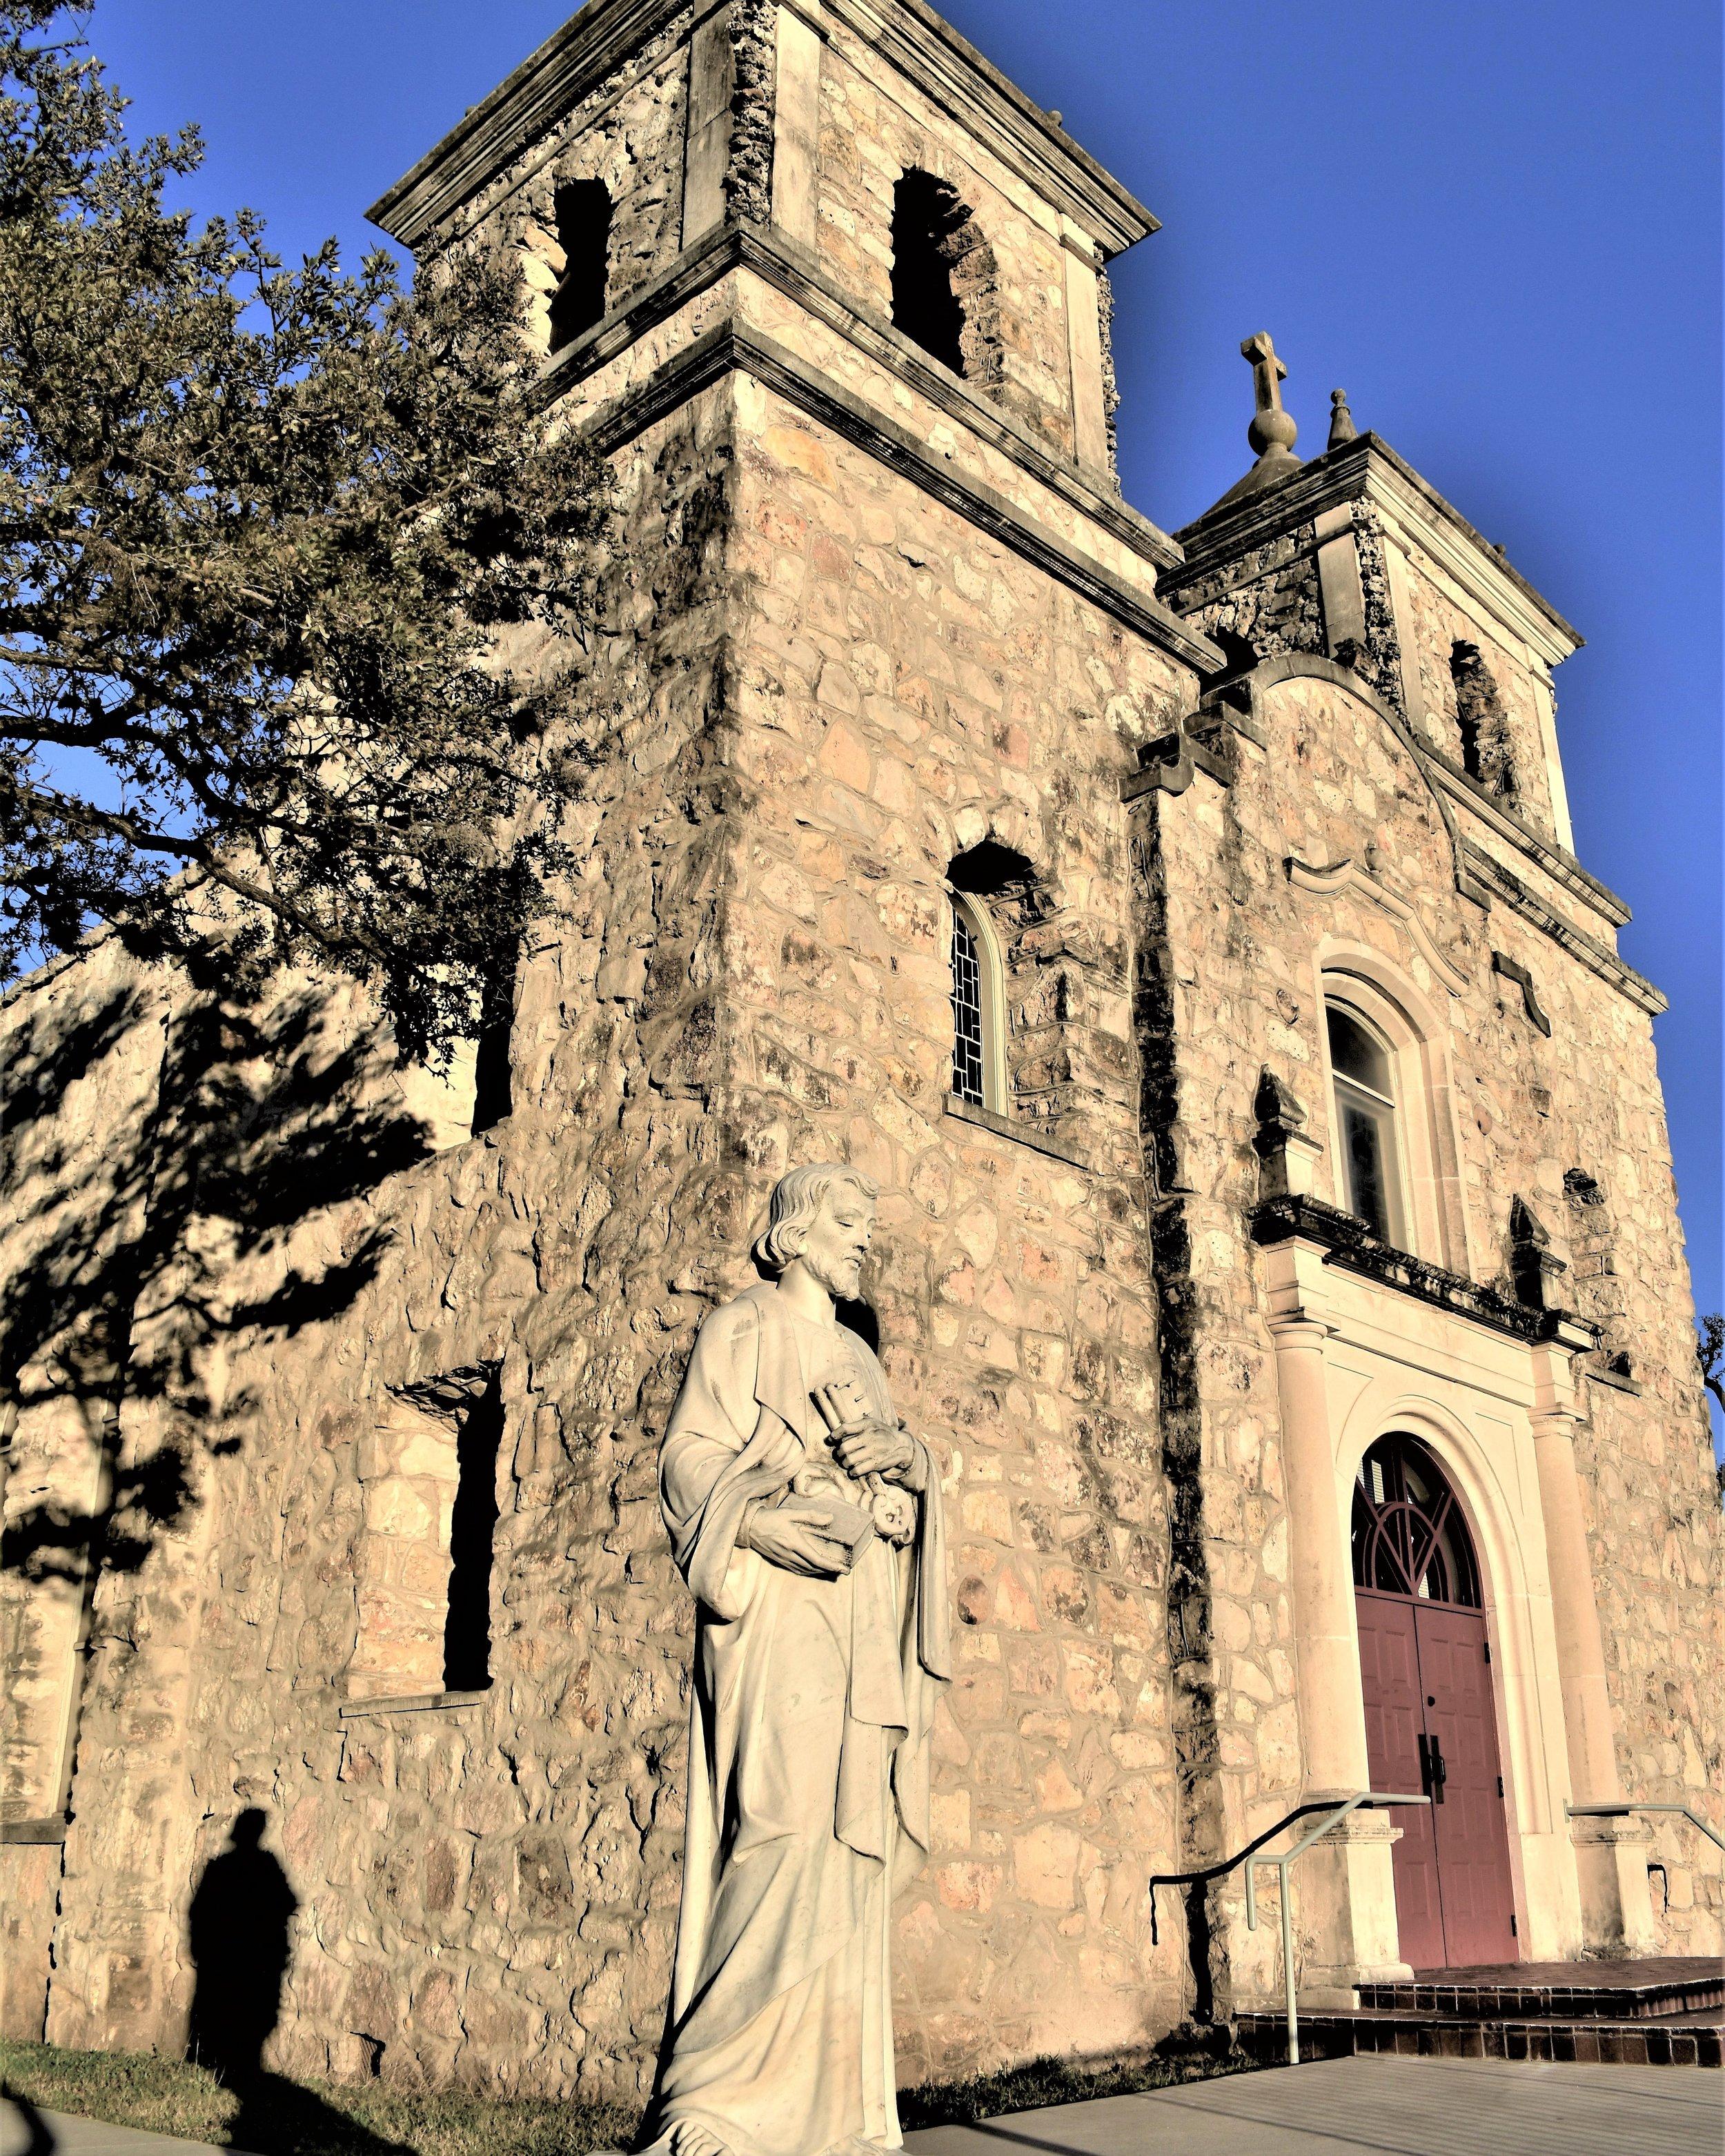 st. peter the apostle catholic church 4th of july celebration boerne texas